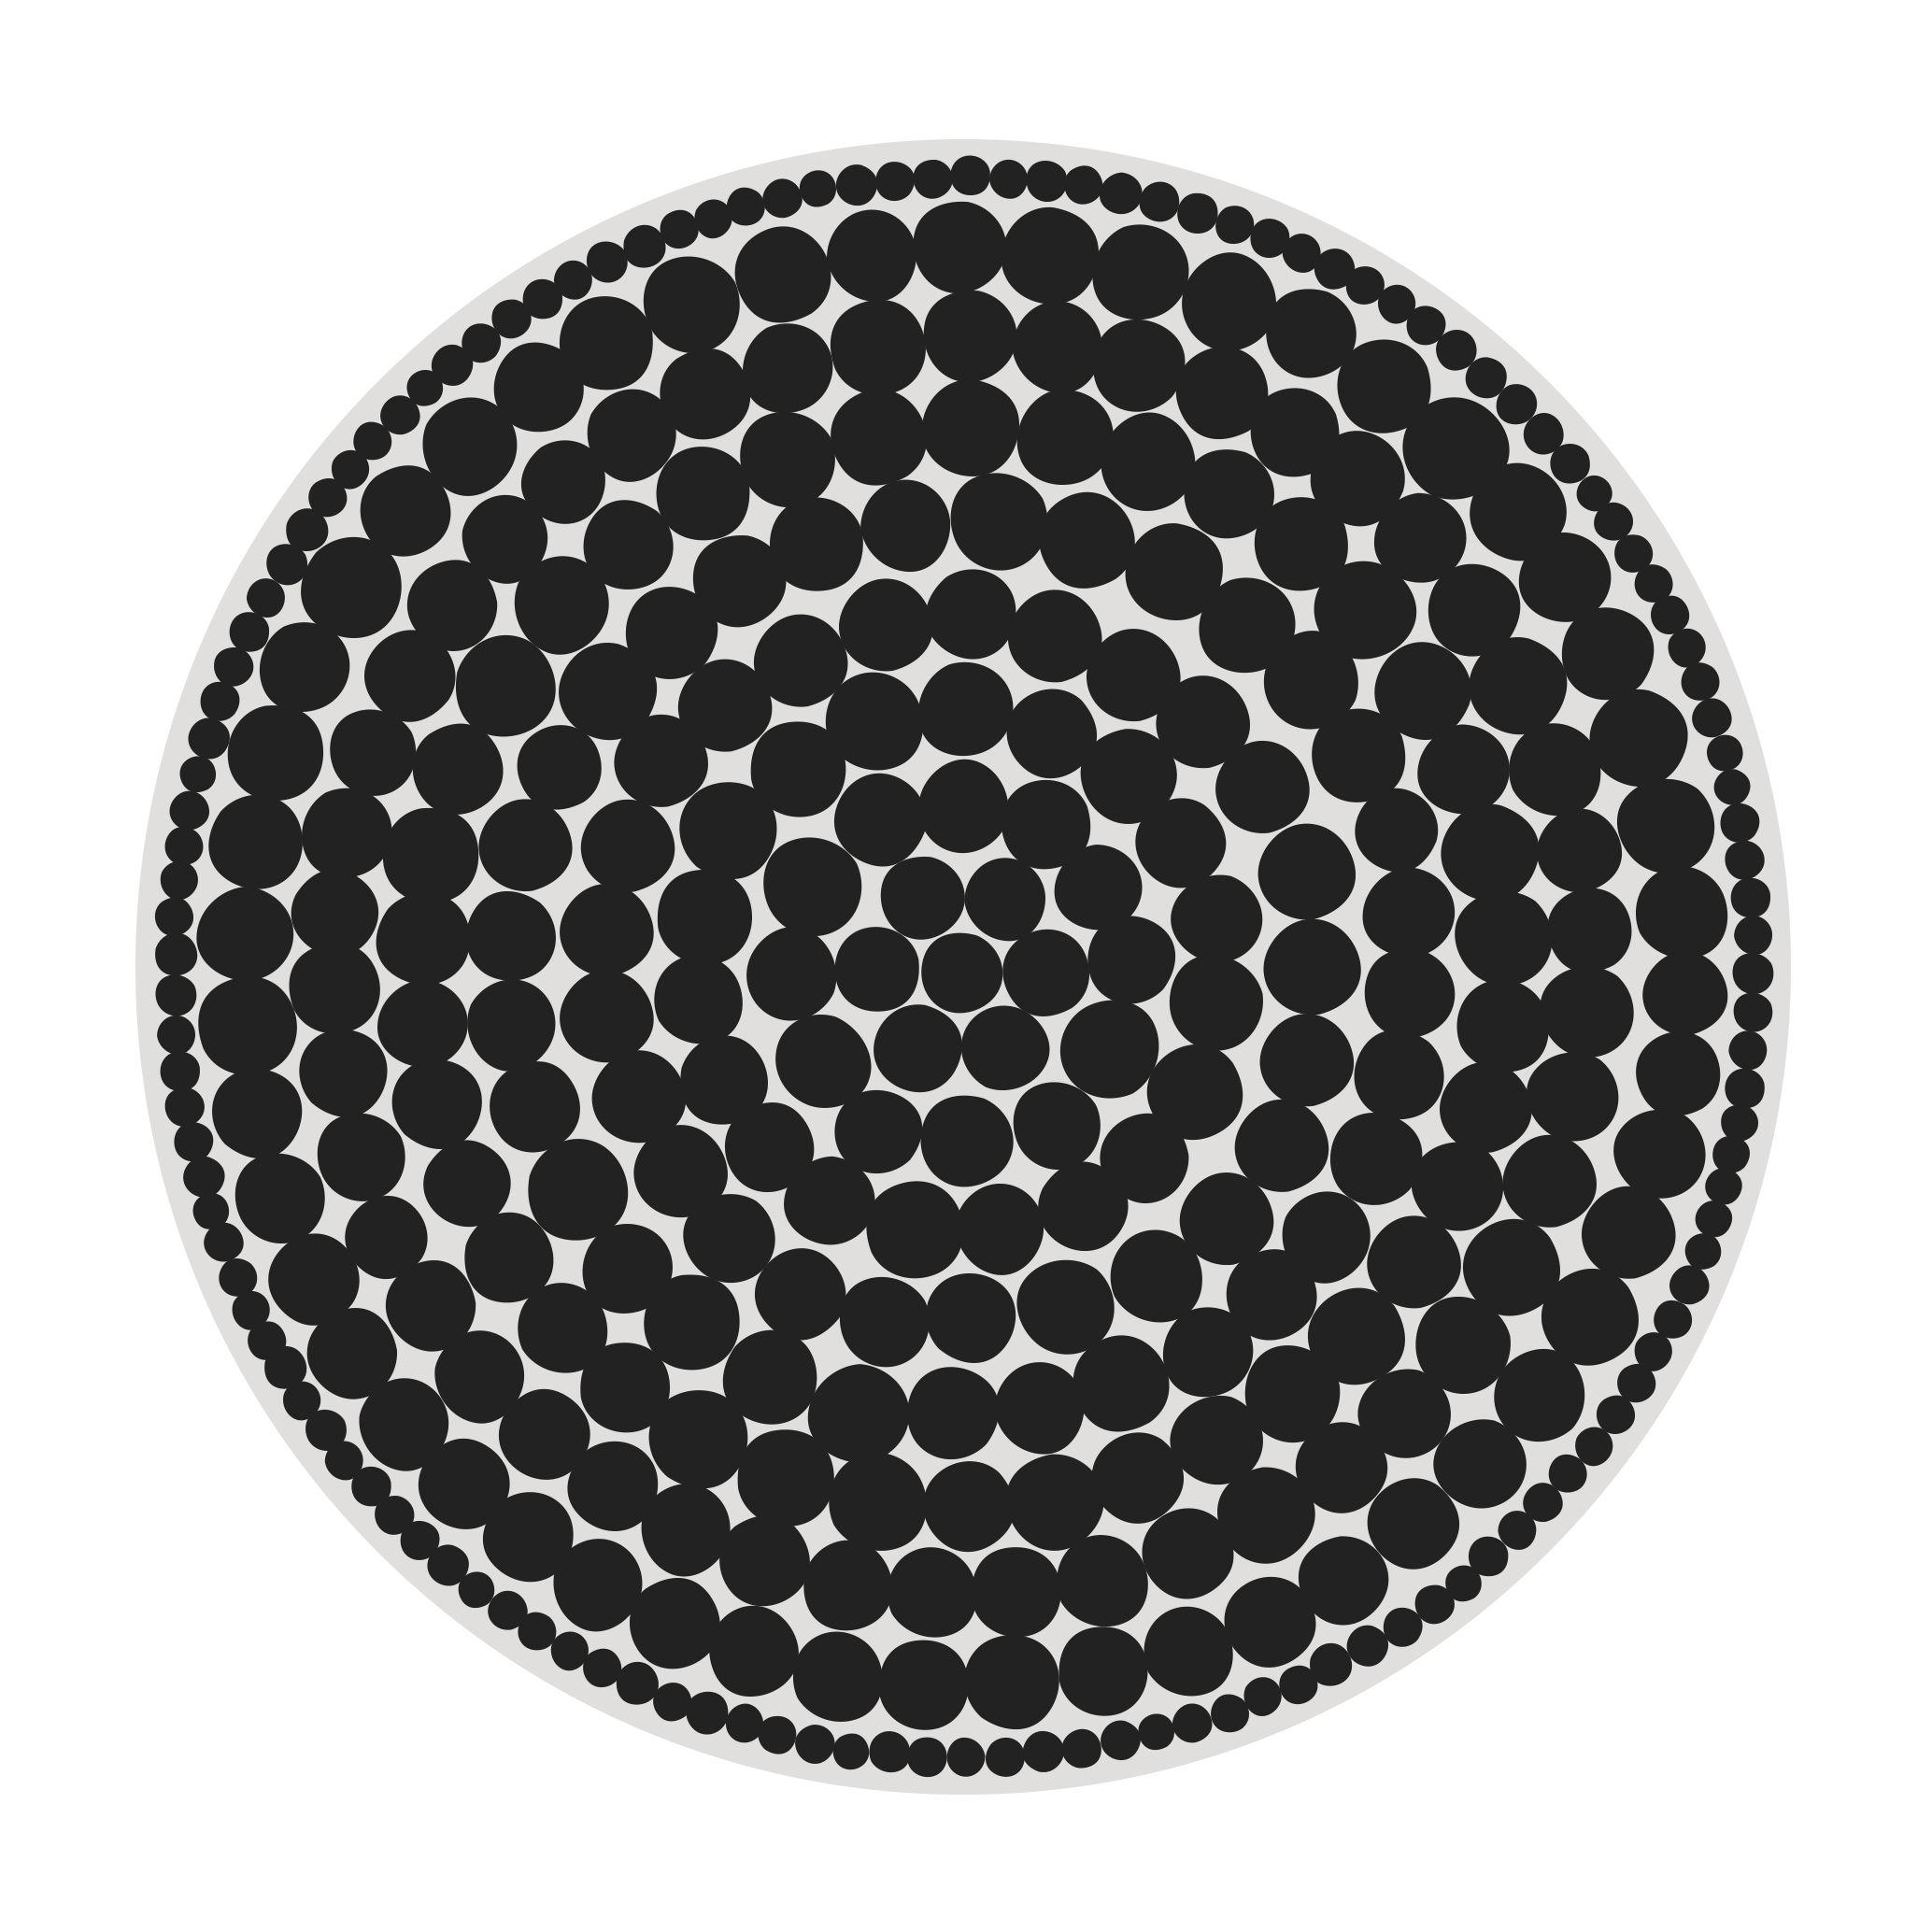 Tapis black bombay p devache noir blanc 145 made - Made in design tapis ...